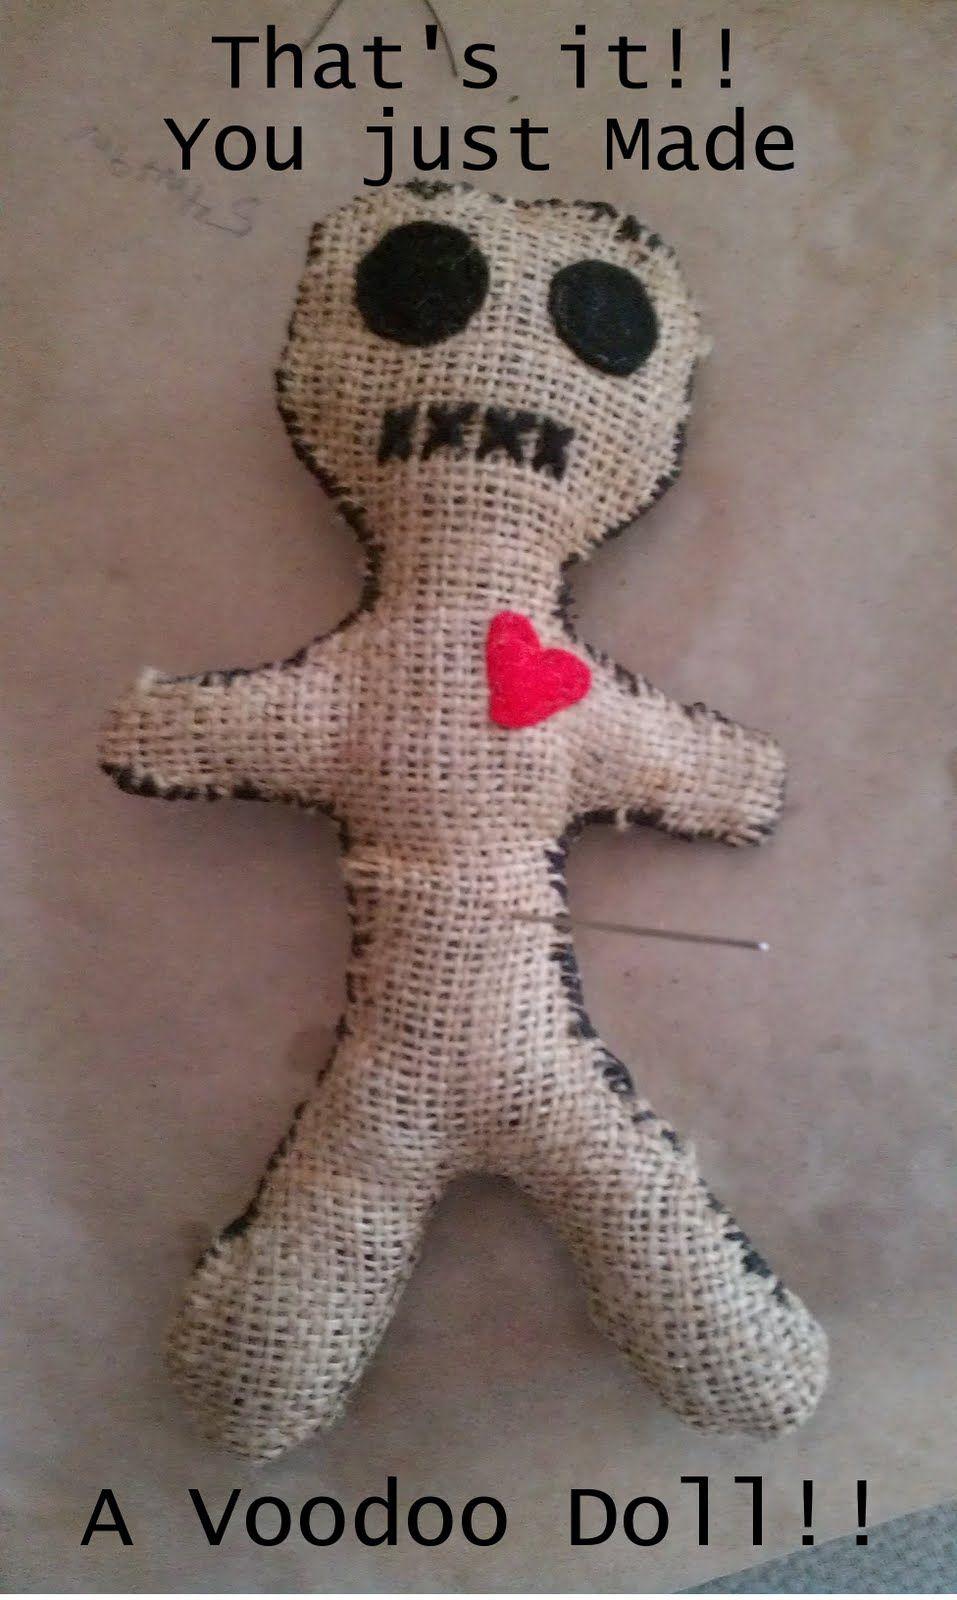 Msbittyknacks Blog Tutorial Make A Voodoo Doll Diy Voodoo Dolls Voodoo Dolls Doll Tutorial